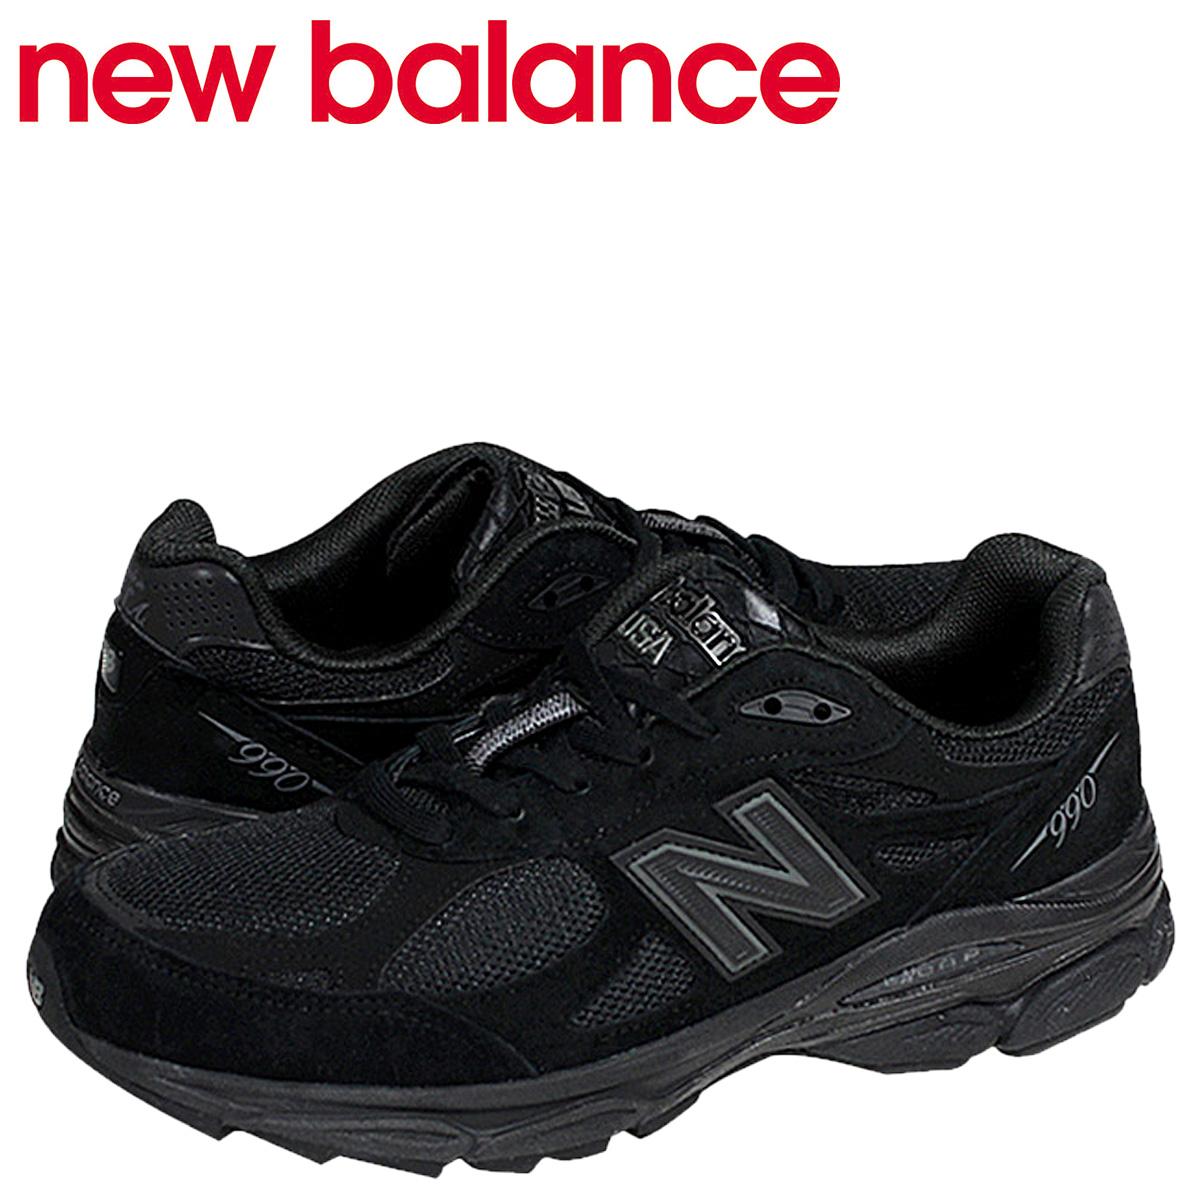 new balance suede mesh